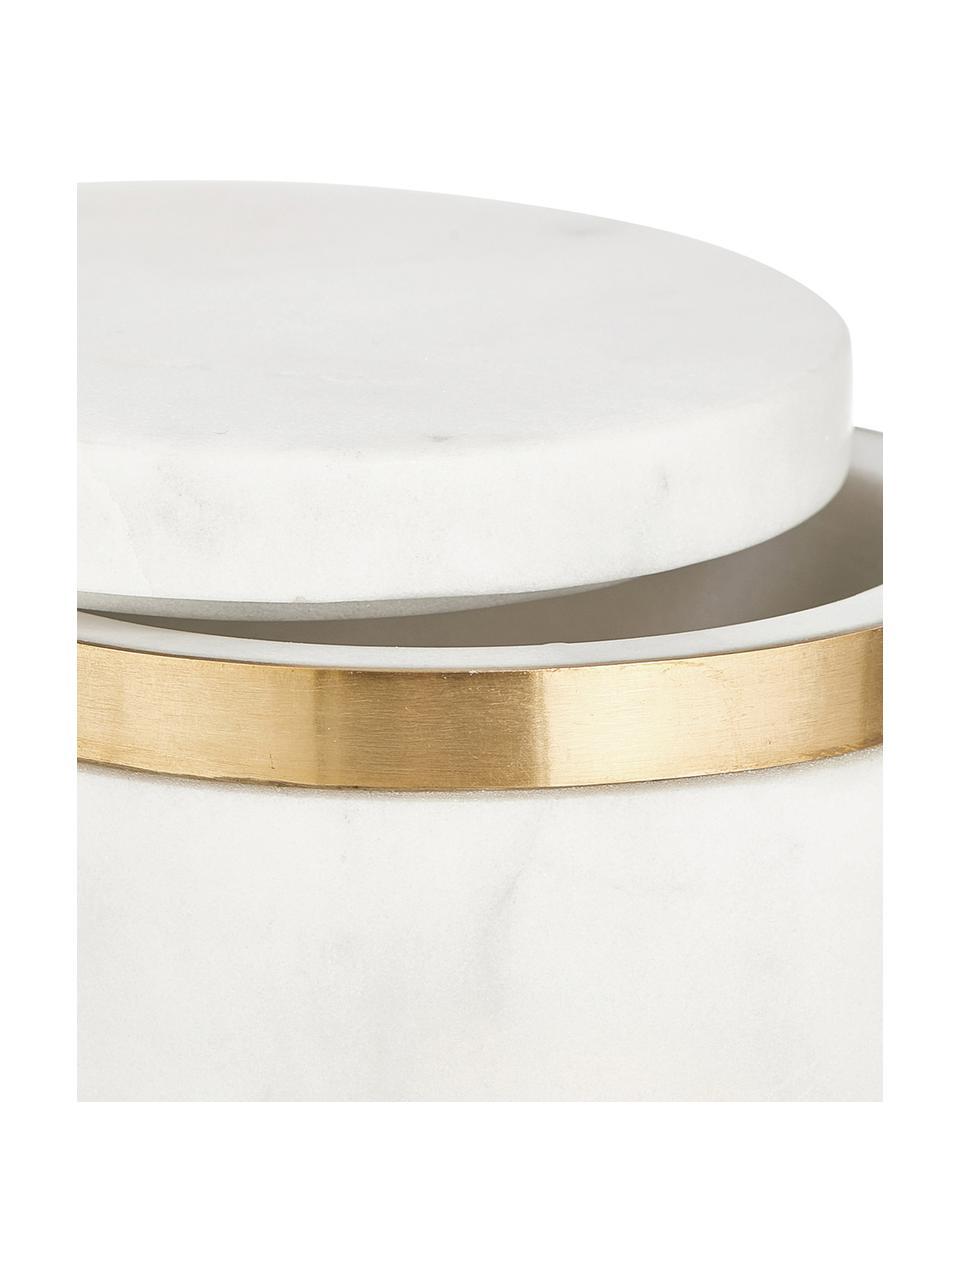 Opbergpot Maniu, Marmer, Wit, Ø 12 x H 16 cm